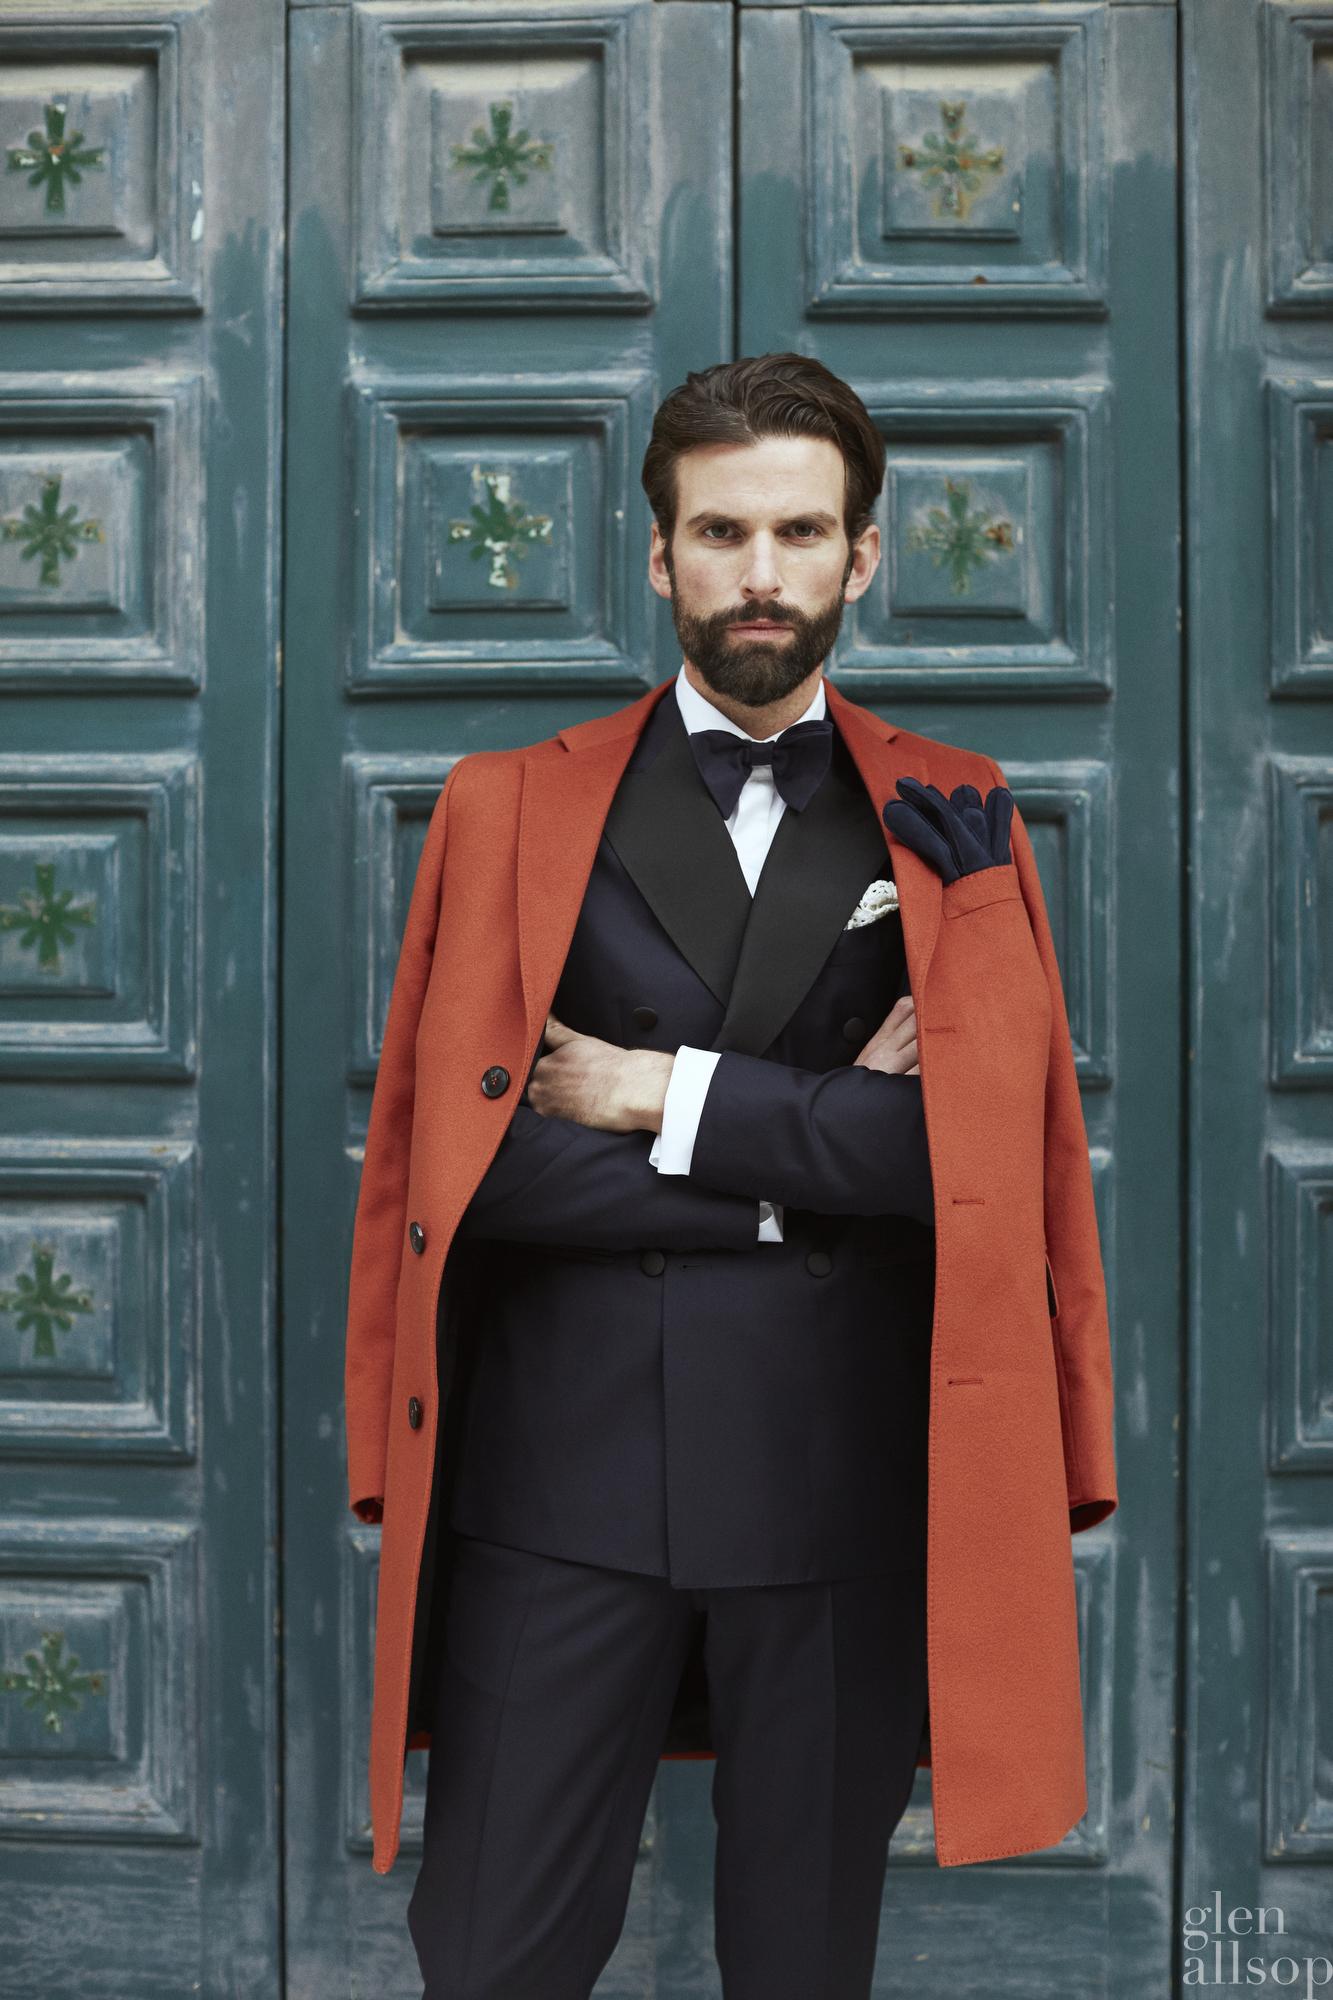 tuxedo-orange top coat-marcus malmborg